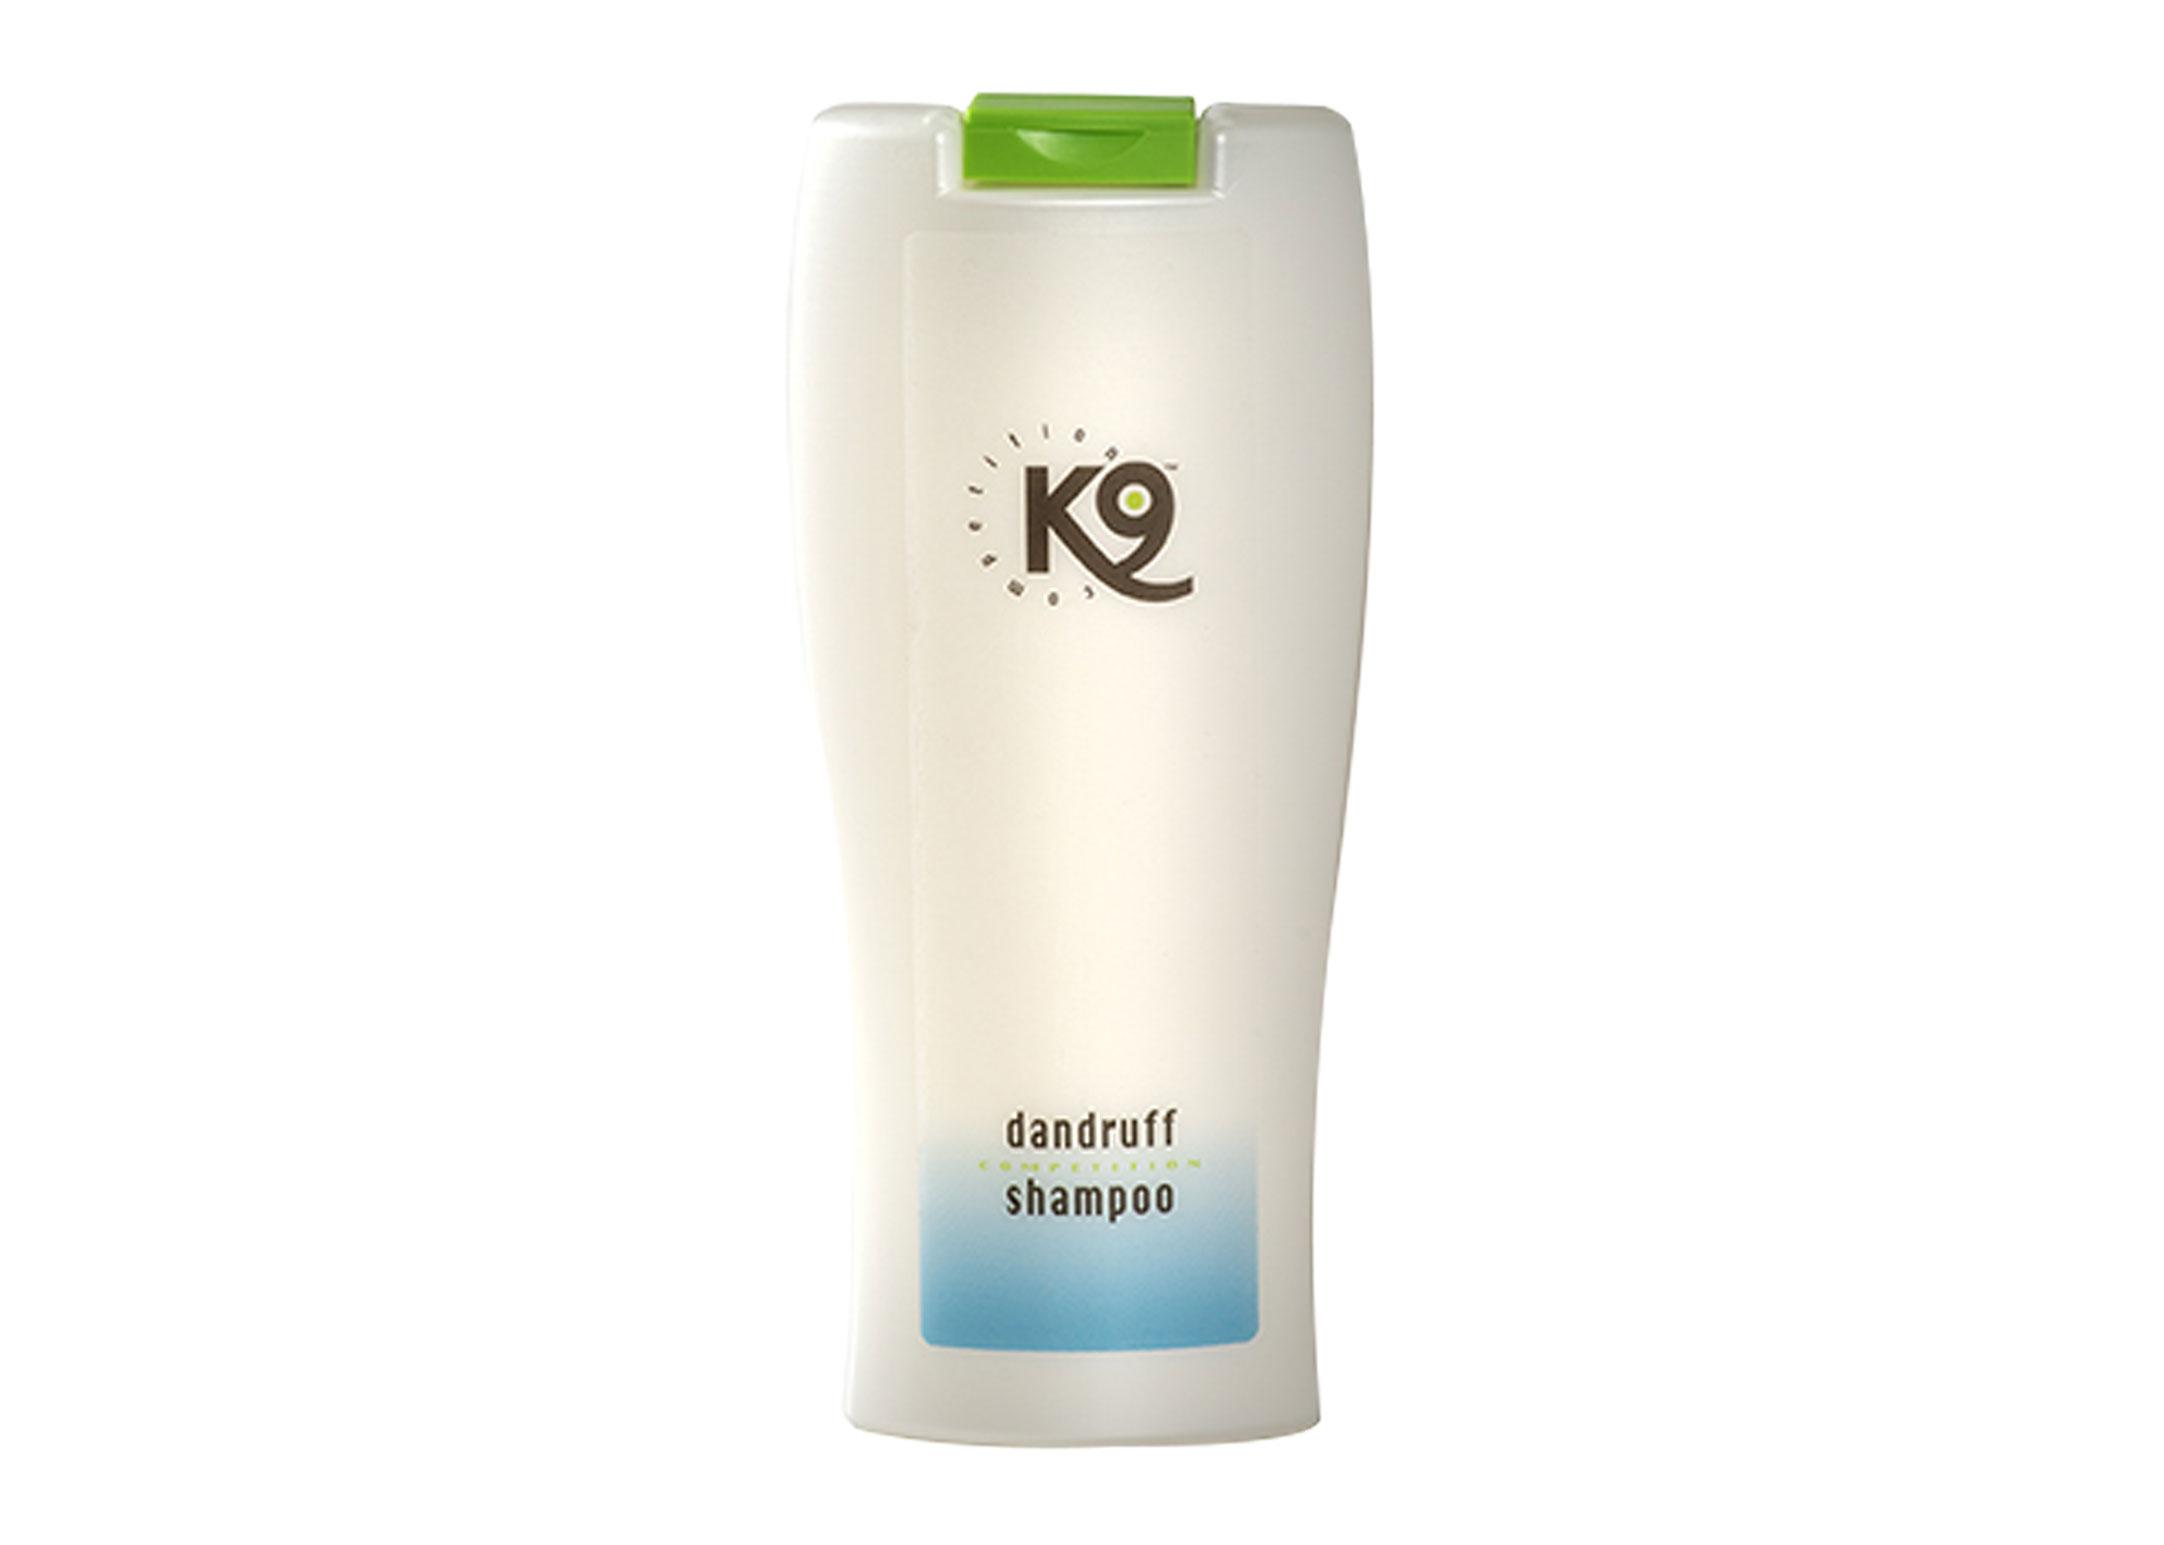 K9 Dandruff Shampoo 300ml Shampoo